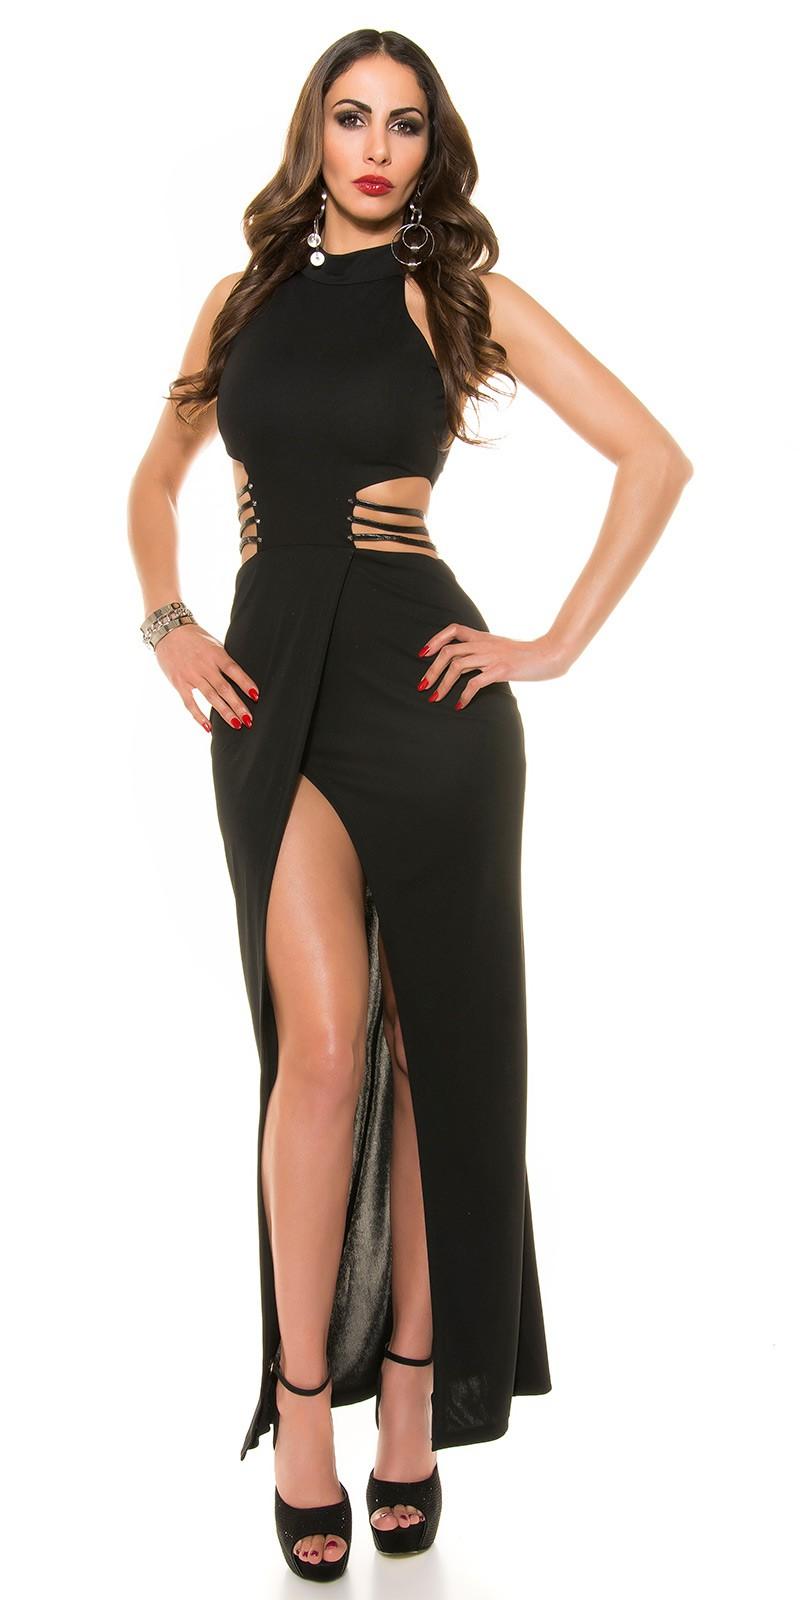 b3a99e9eb7d2 ooKouCla Kleid mit Sexy cut  slot  Color BLACK Size L 0000K9359 SCHWARZ 23  · Dlhe spolocenske saty ciernej farby